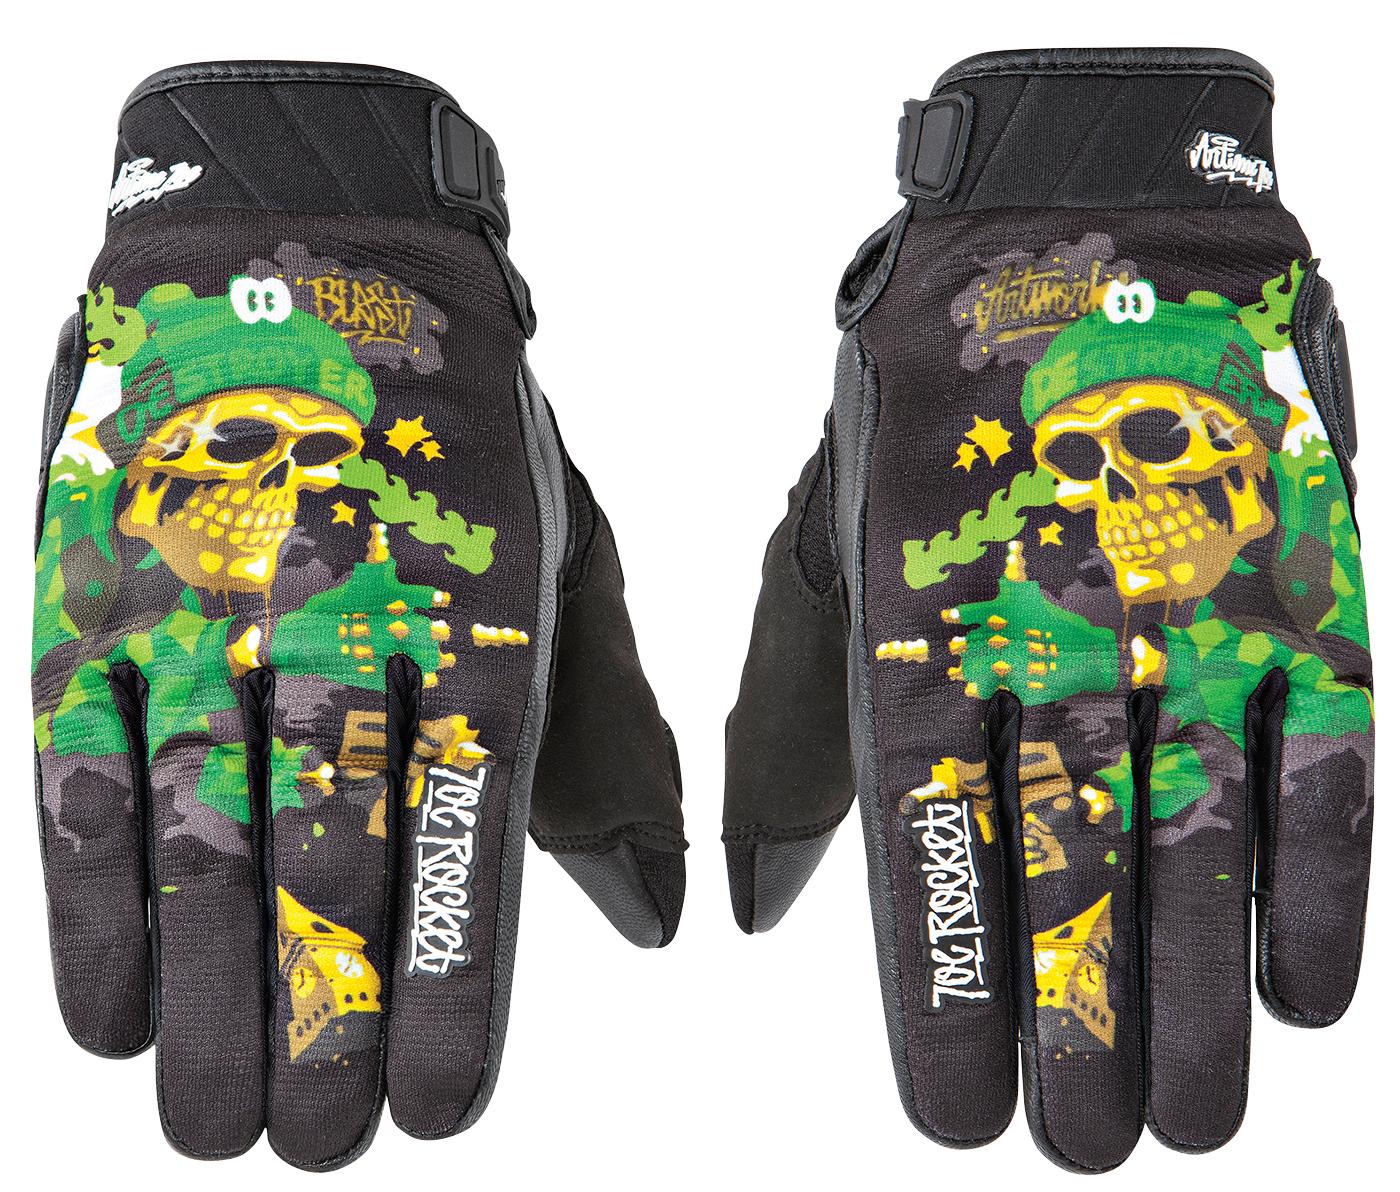 Joe Rocket Phoenix 4.0 Mens Leather Road Race Motorcycle Gloves Blue//Black//Silver//Medium